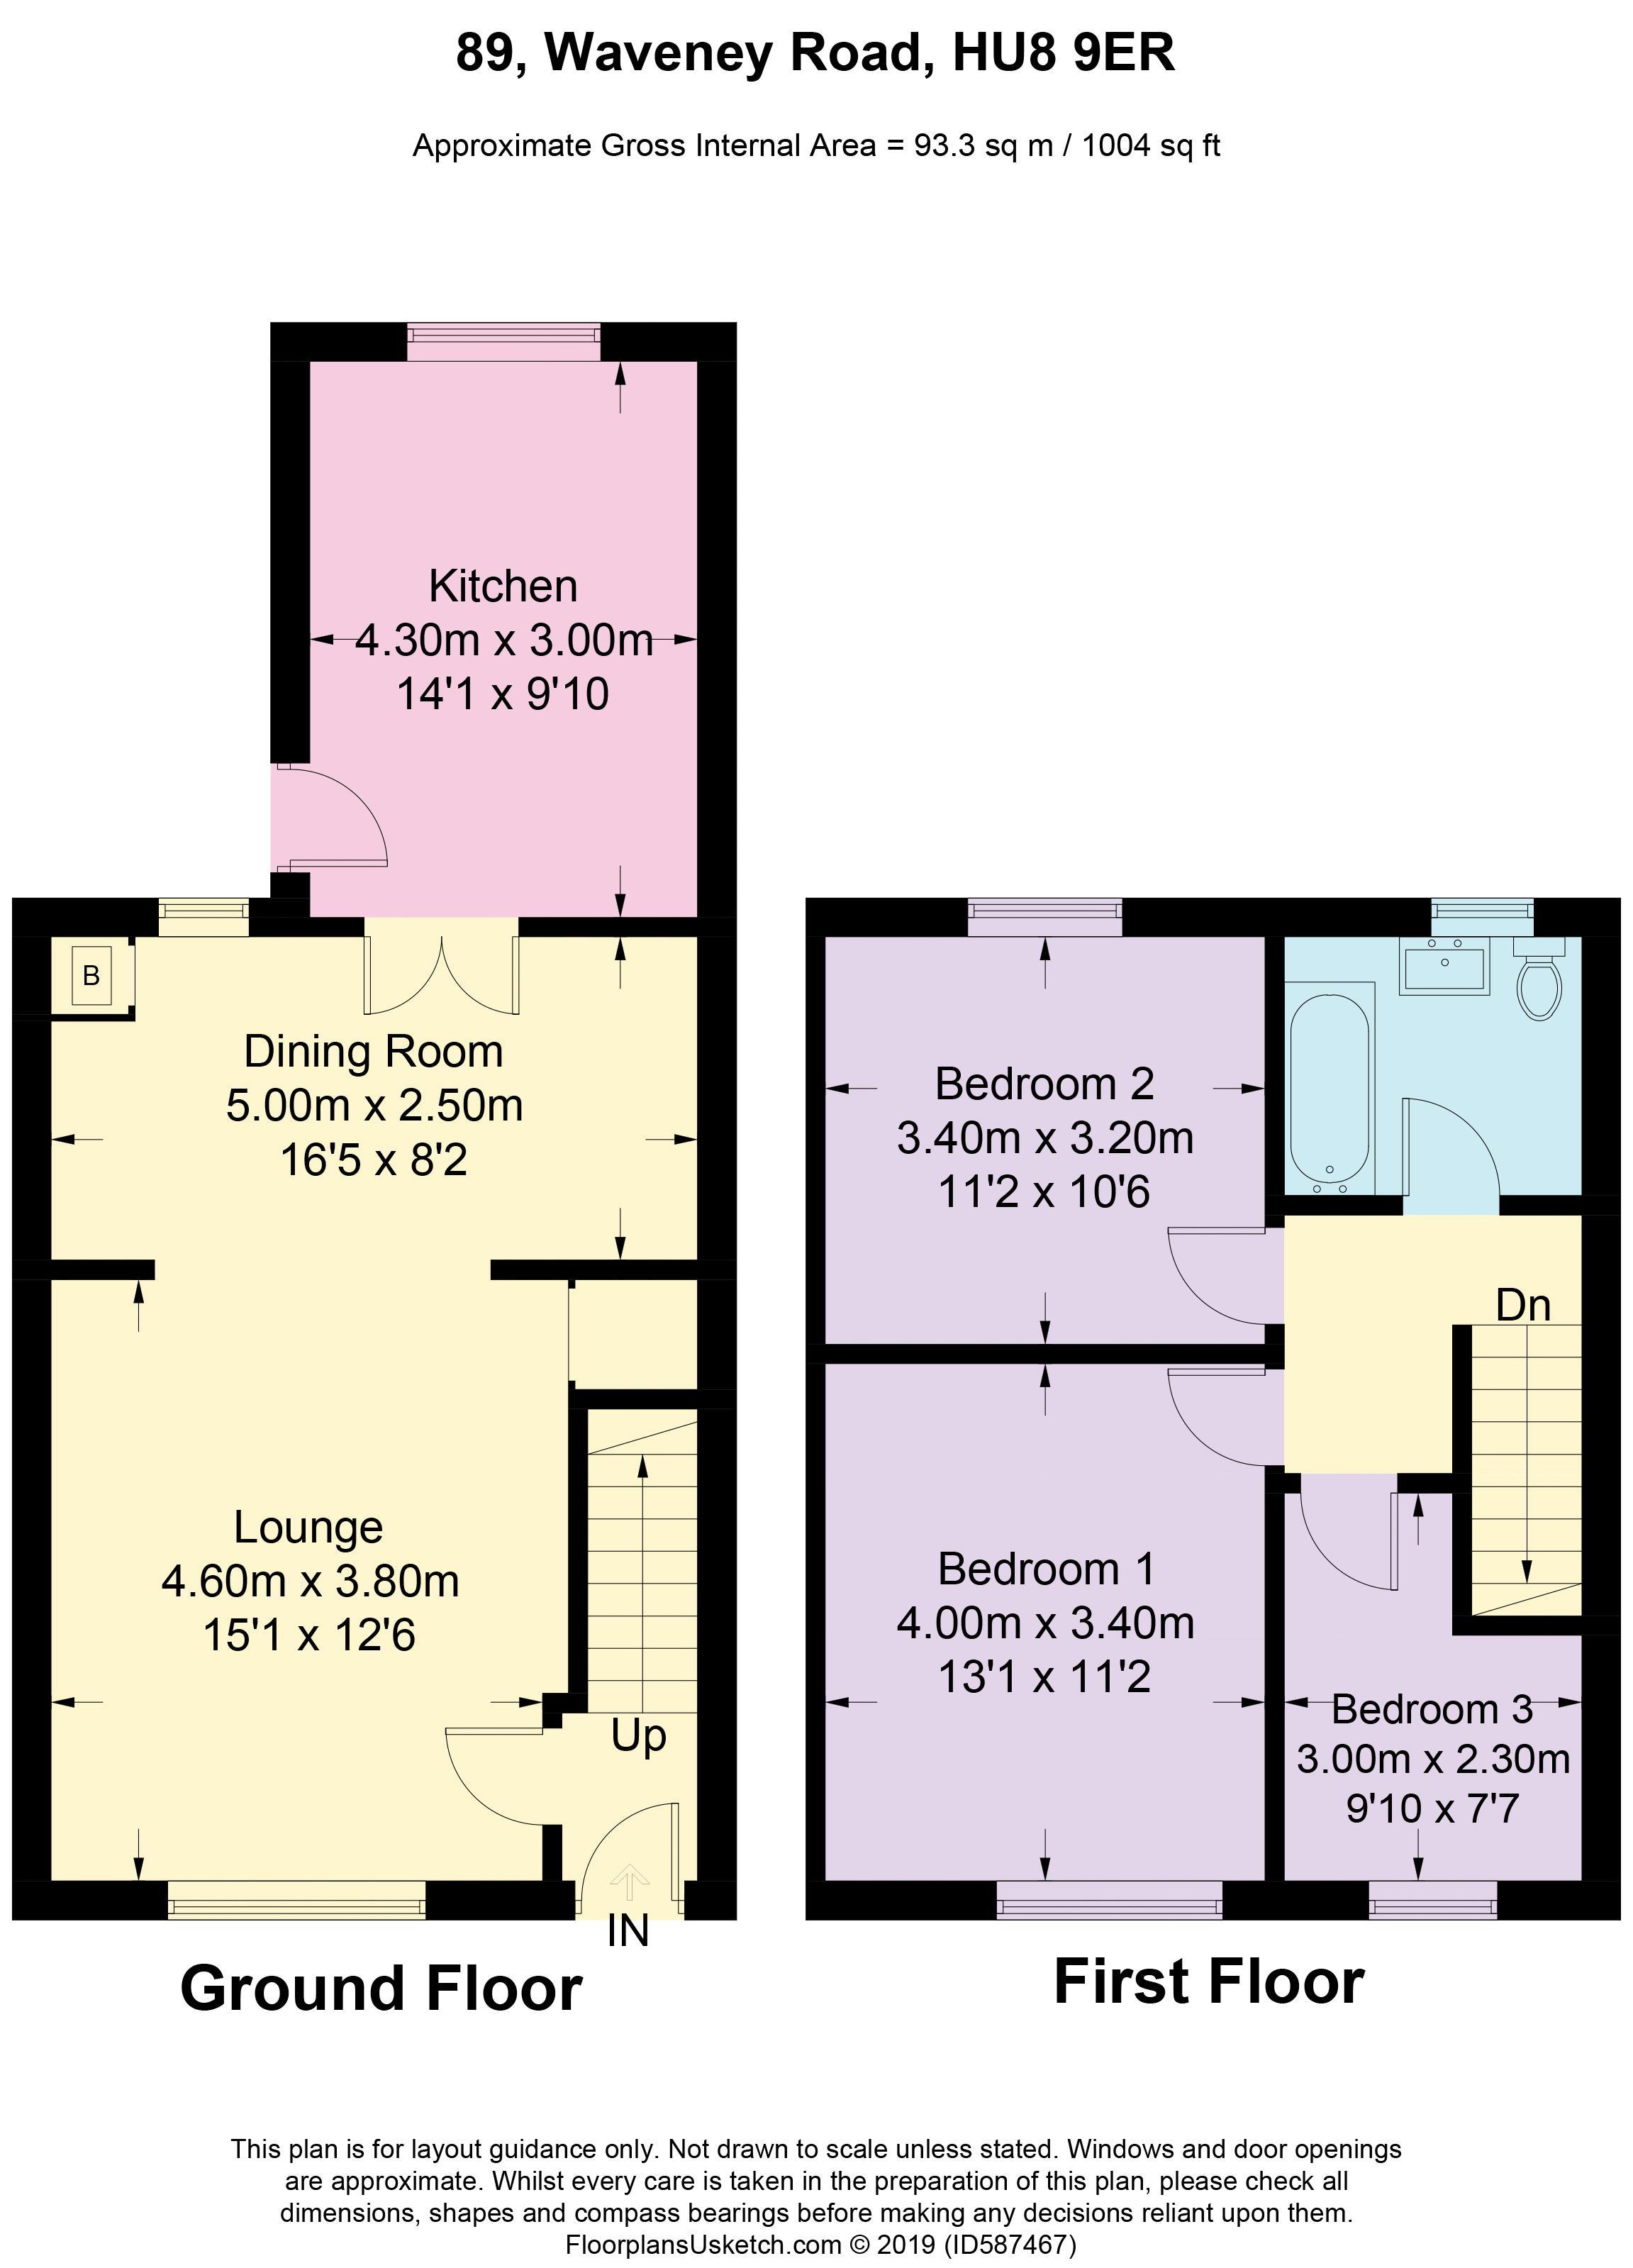 Waveney Road - Floorplan